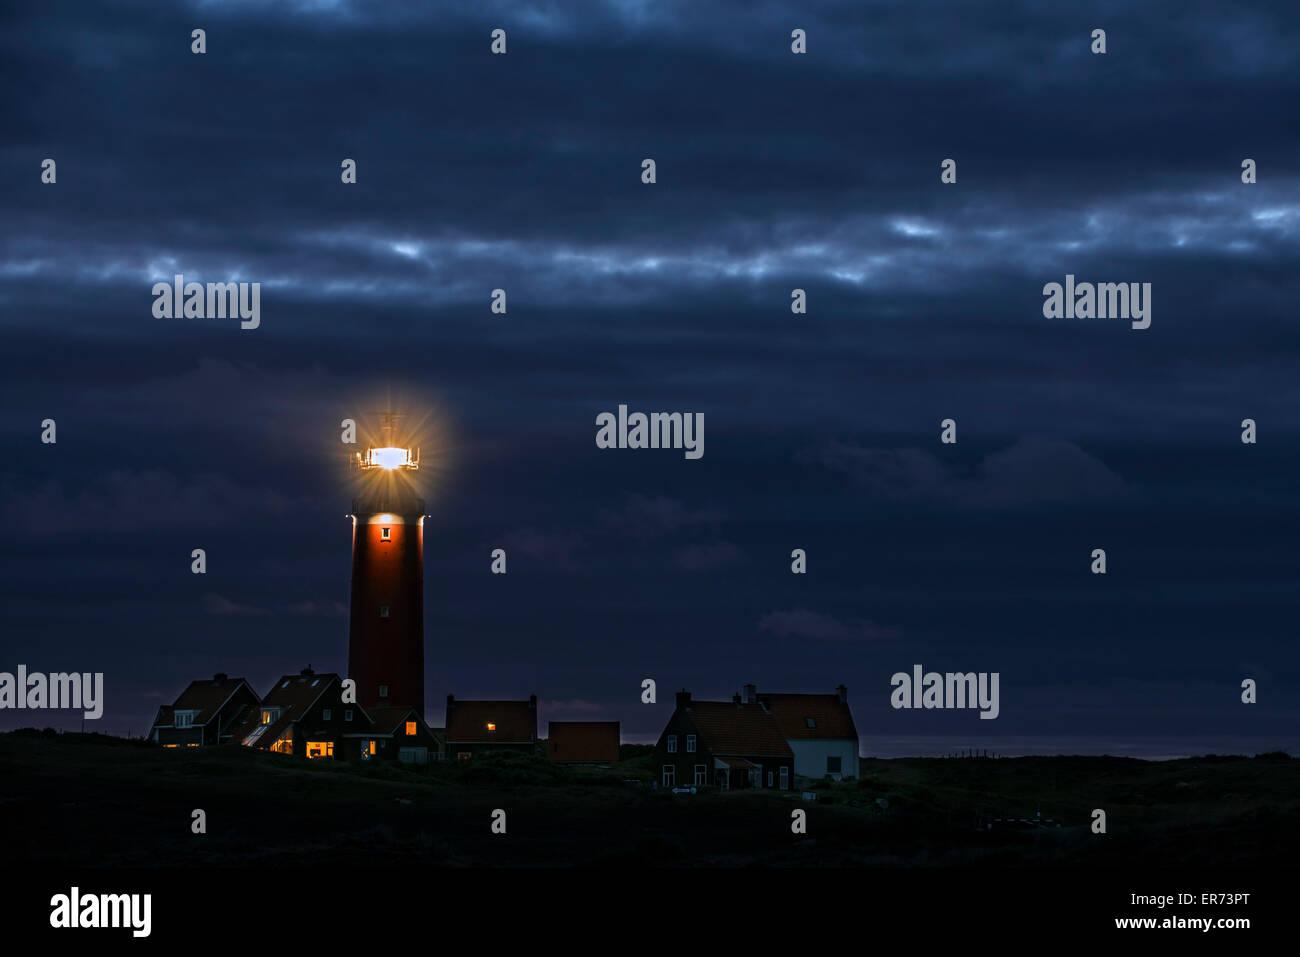 Eierland Lighthouse with light of lantern shining over